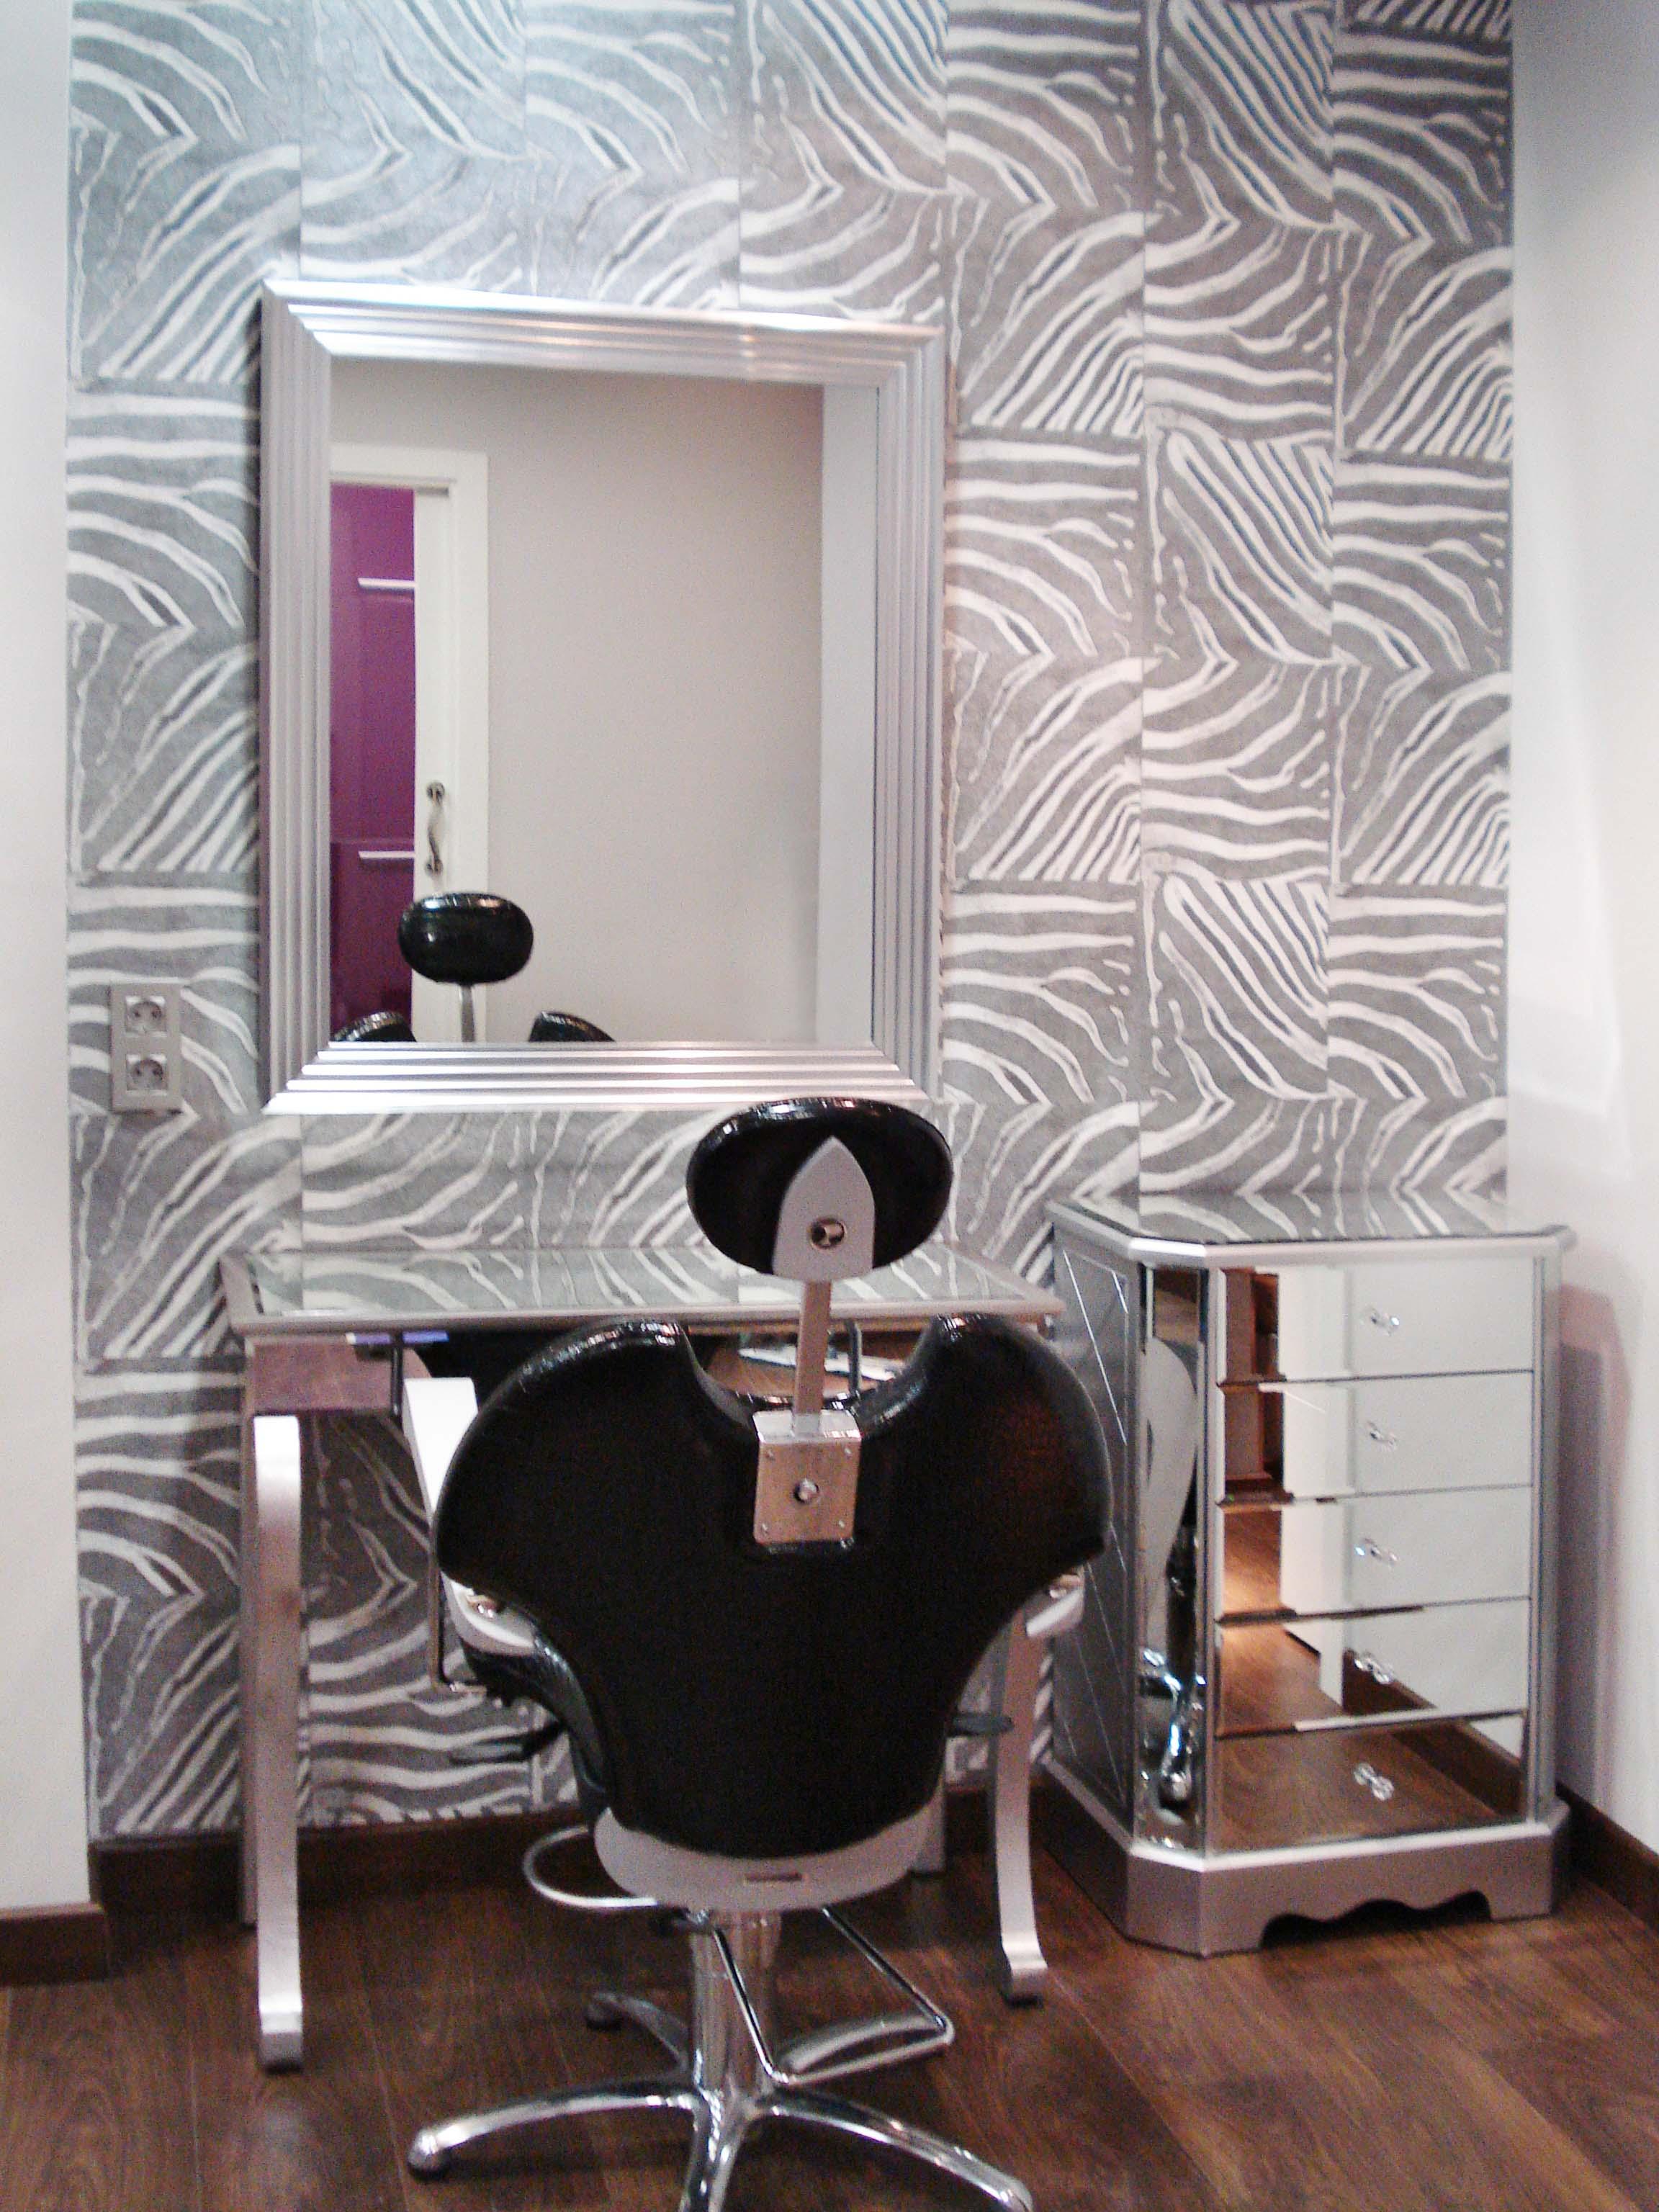 Decoradores de interiores en bilbao excellent decoradores - Decoracion de interiores bilbao ...